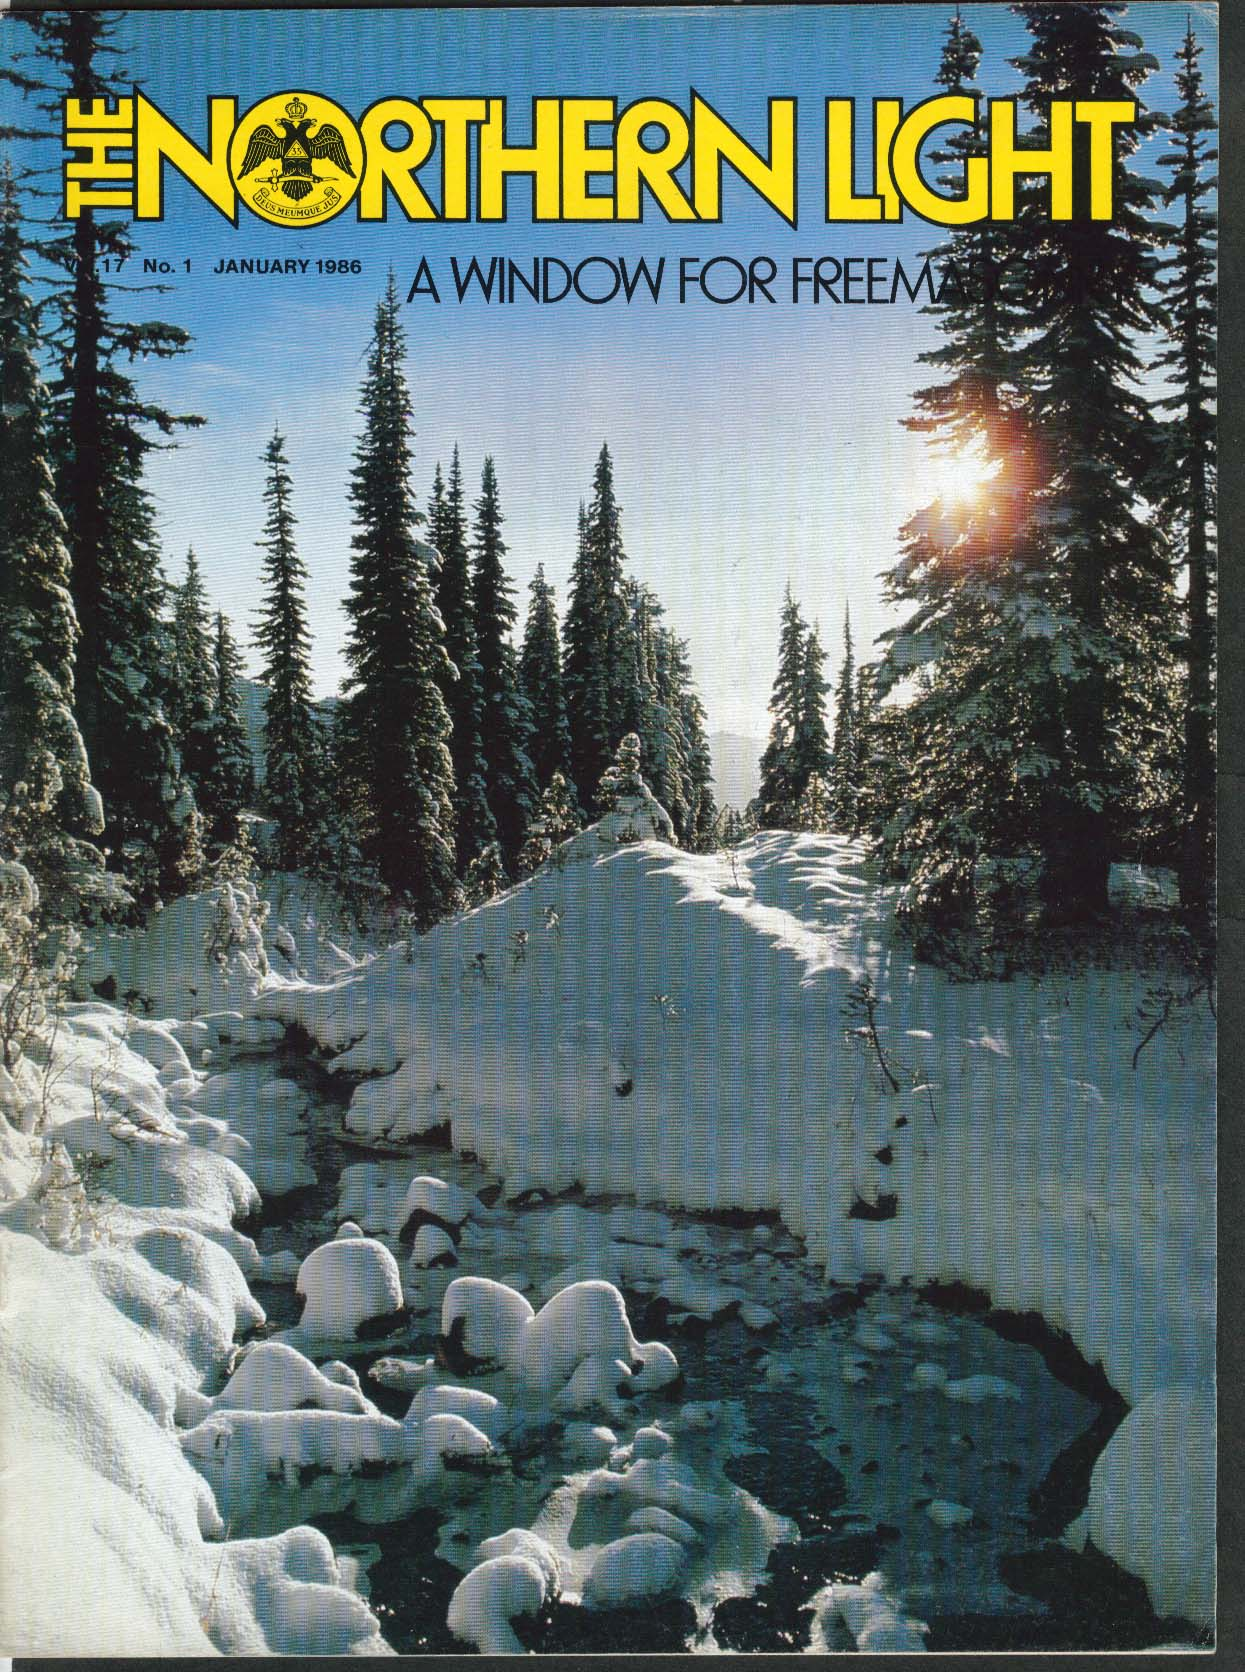 Image for NORTHERN LIGHT Vol 17 #1 Delmar Darrah Abbott Scholarship Schizophrenia 1 1986